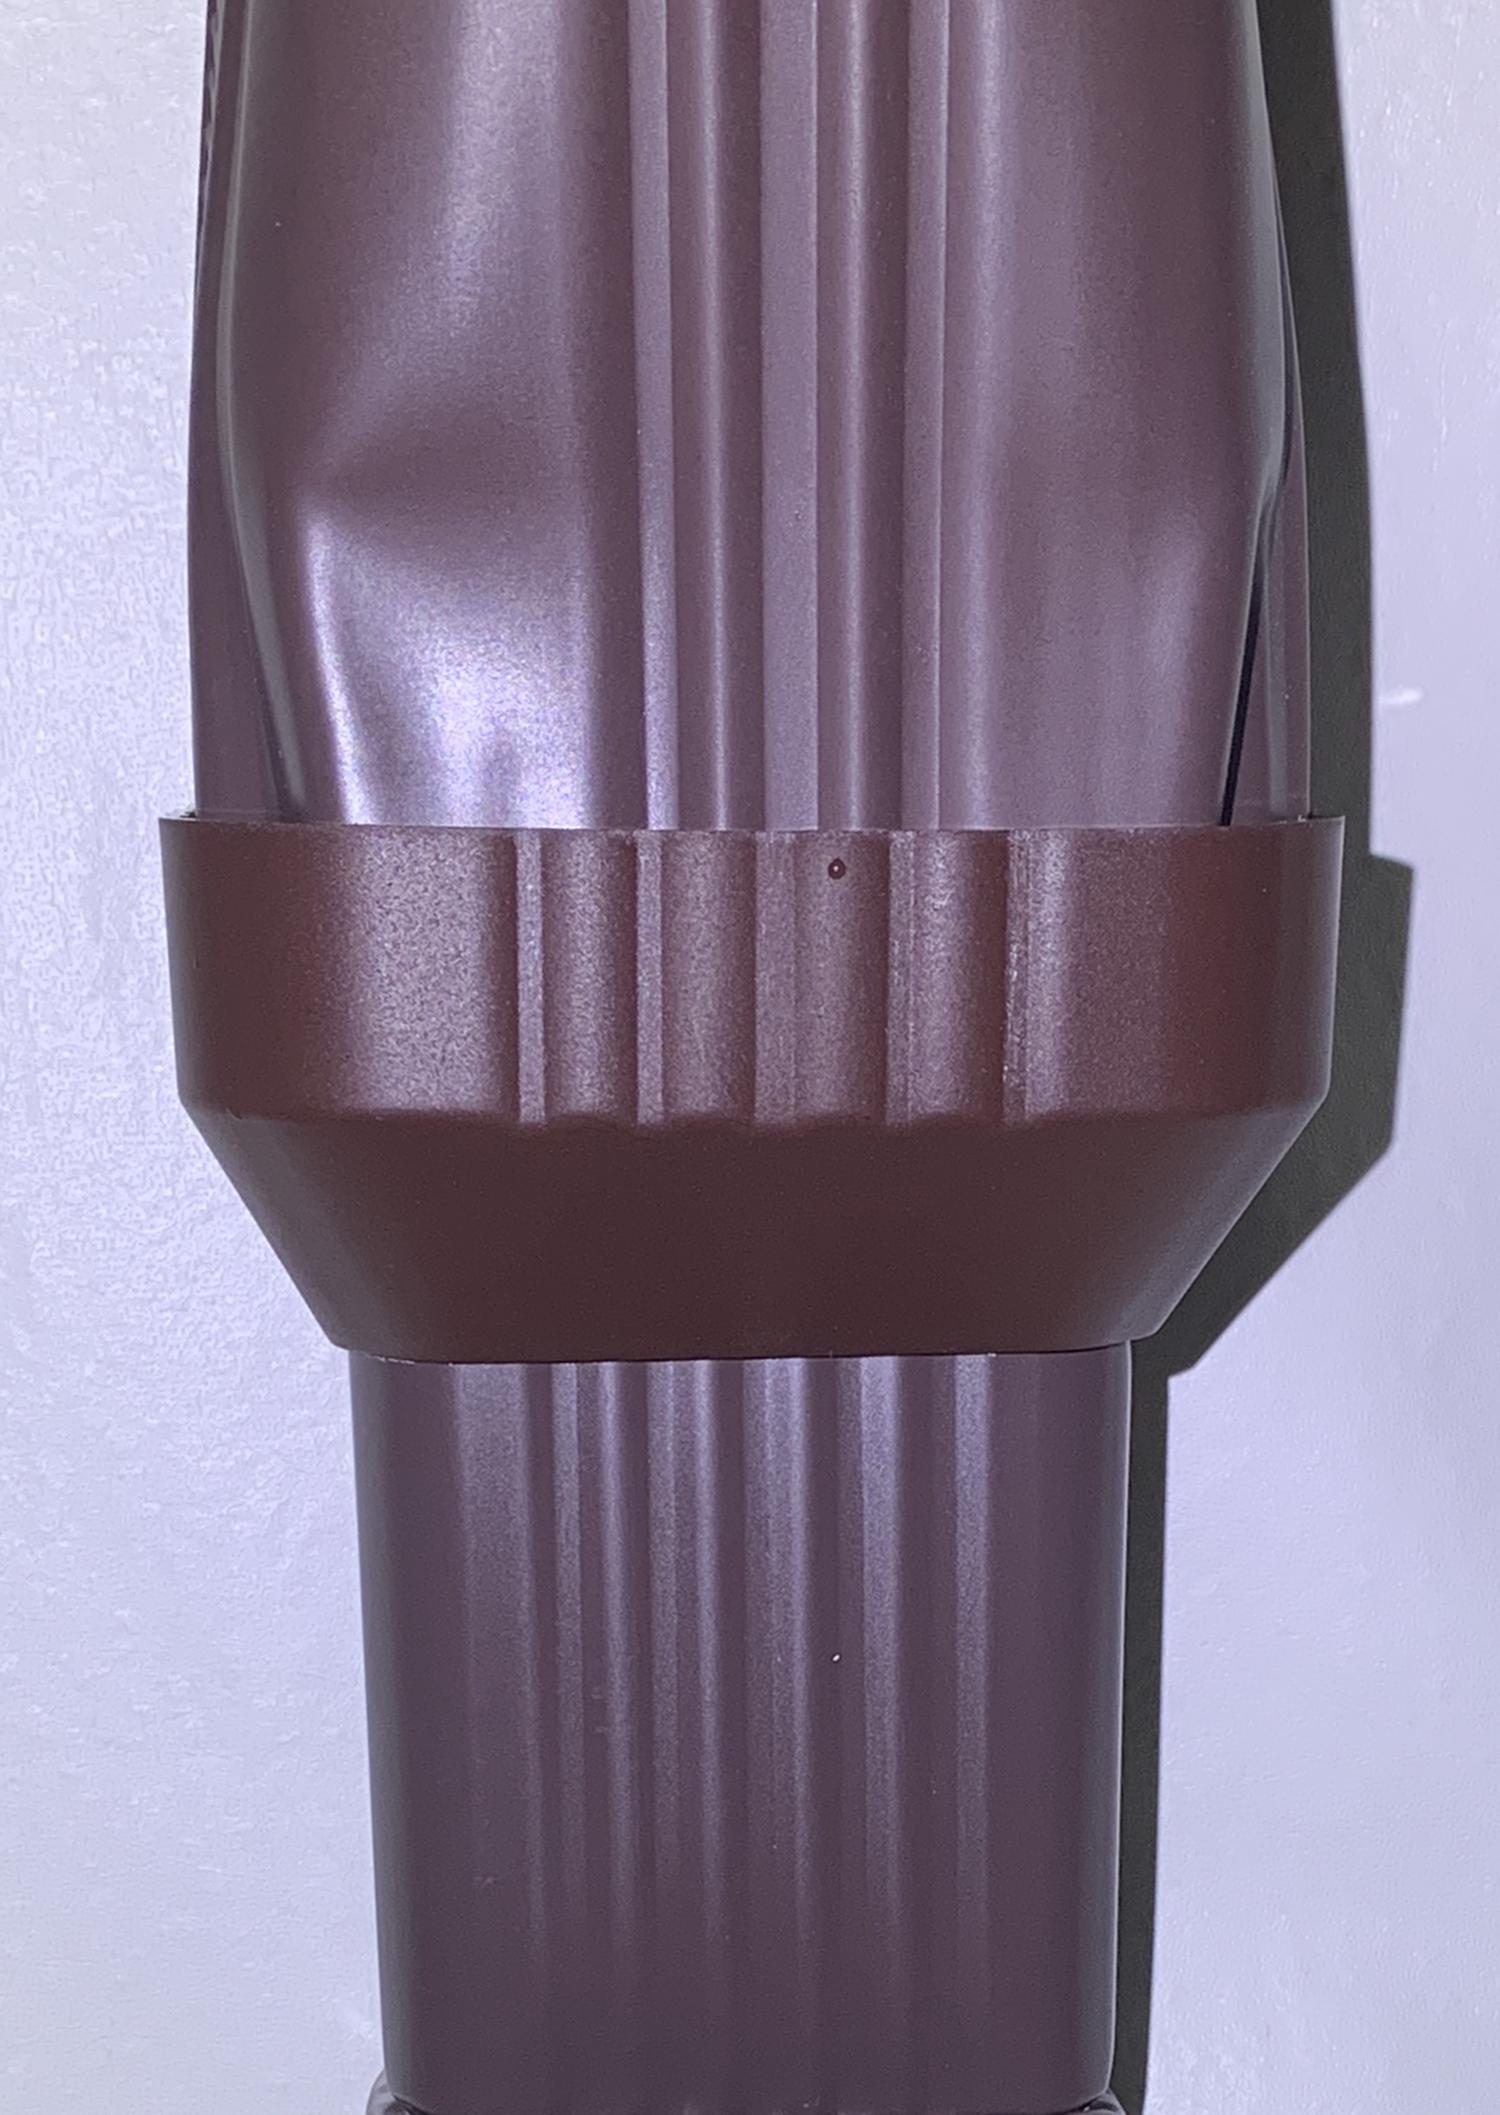 3x4 To 2x3 Gutter Downspout Reducer Downspout To Downspout Adapters Abpdsadptr 3423 Btm Aquabarrel Com Rain Barrels Downspout Diverters And Filters Rain Barrel Kits Aquabarrel R